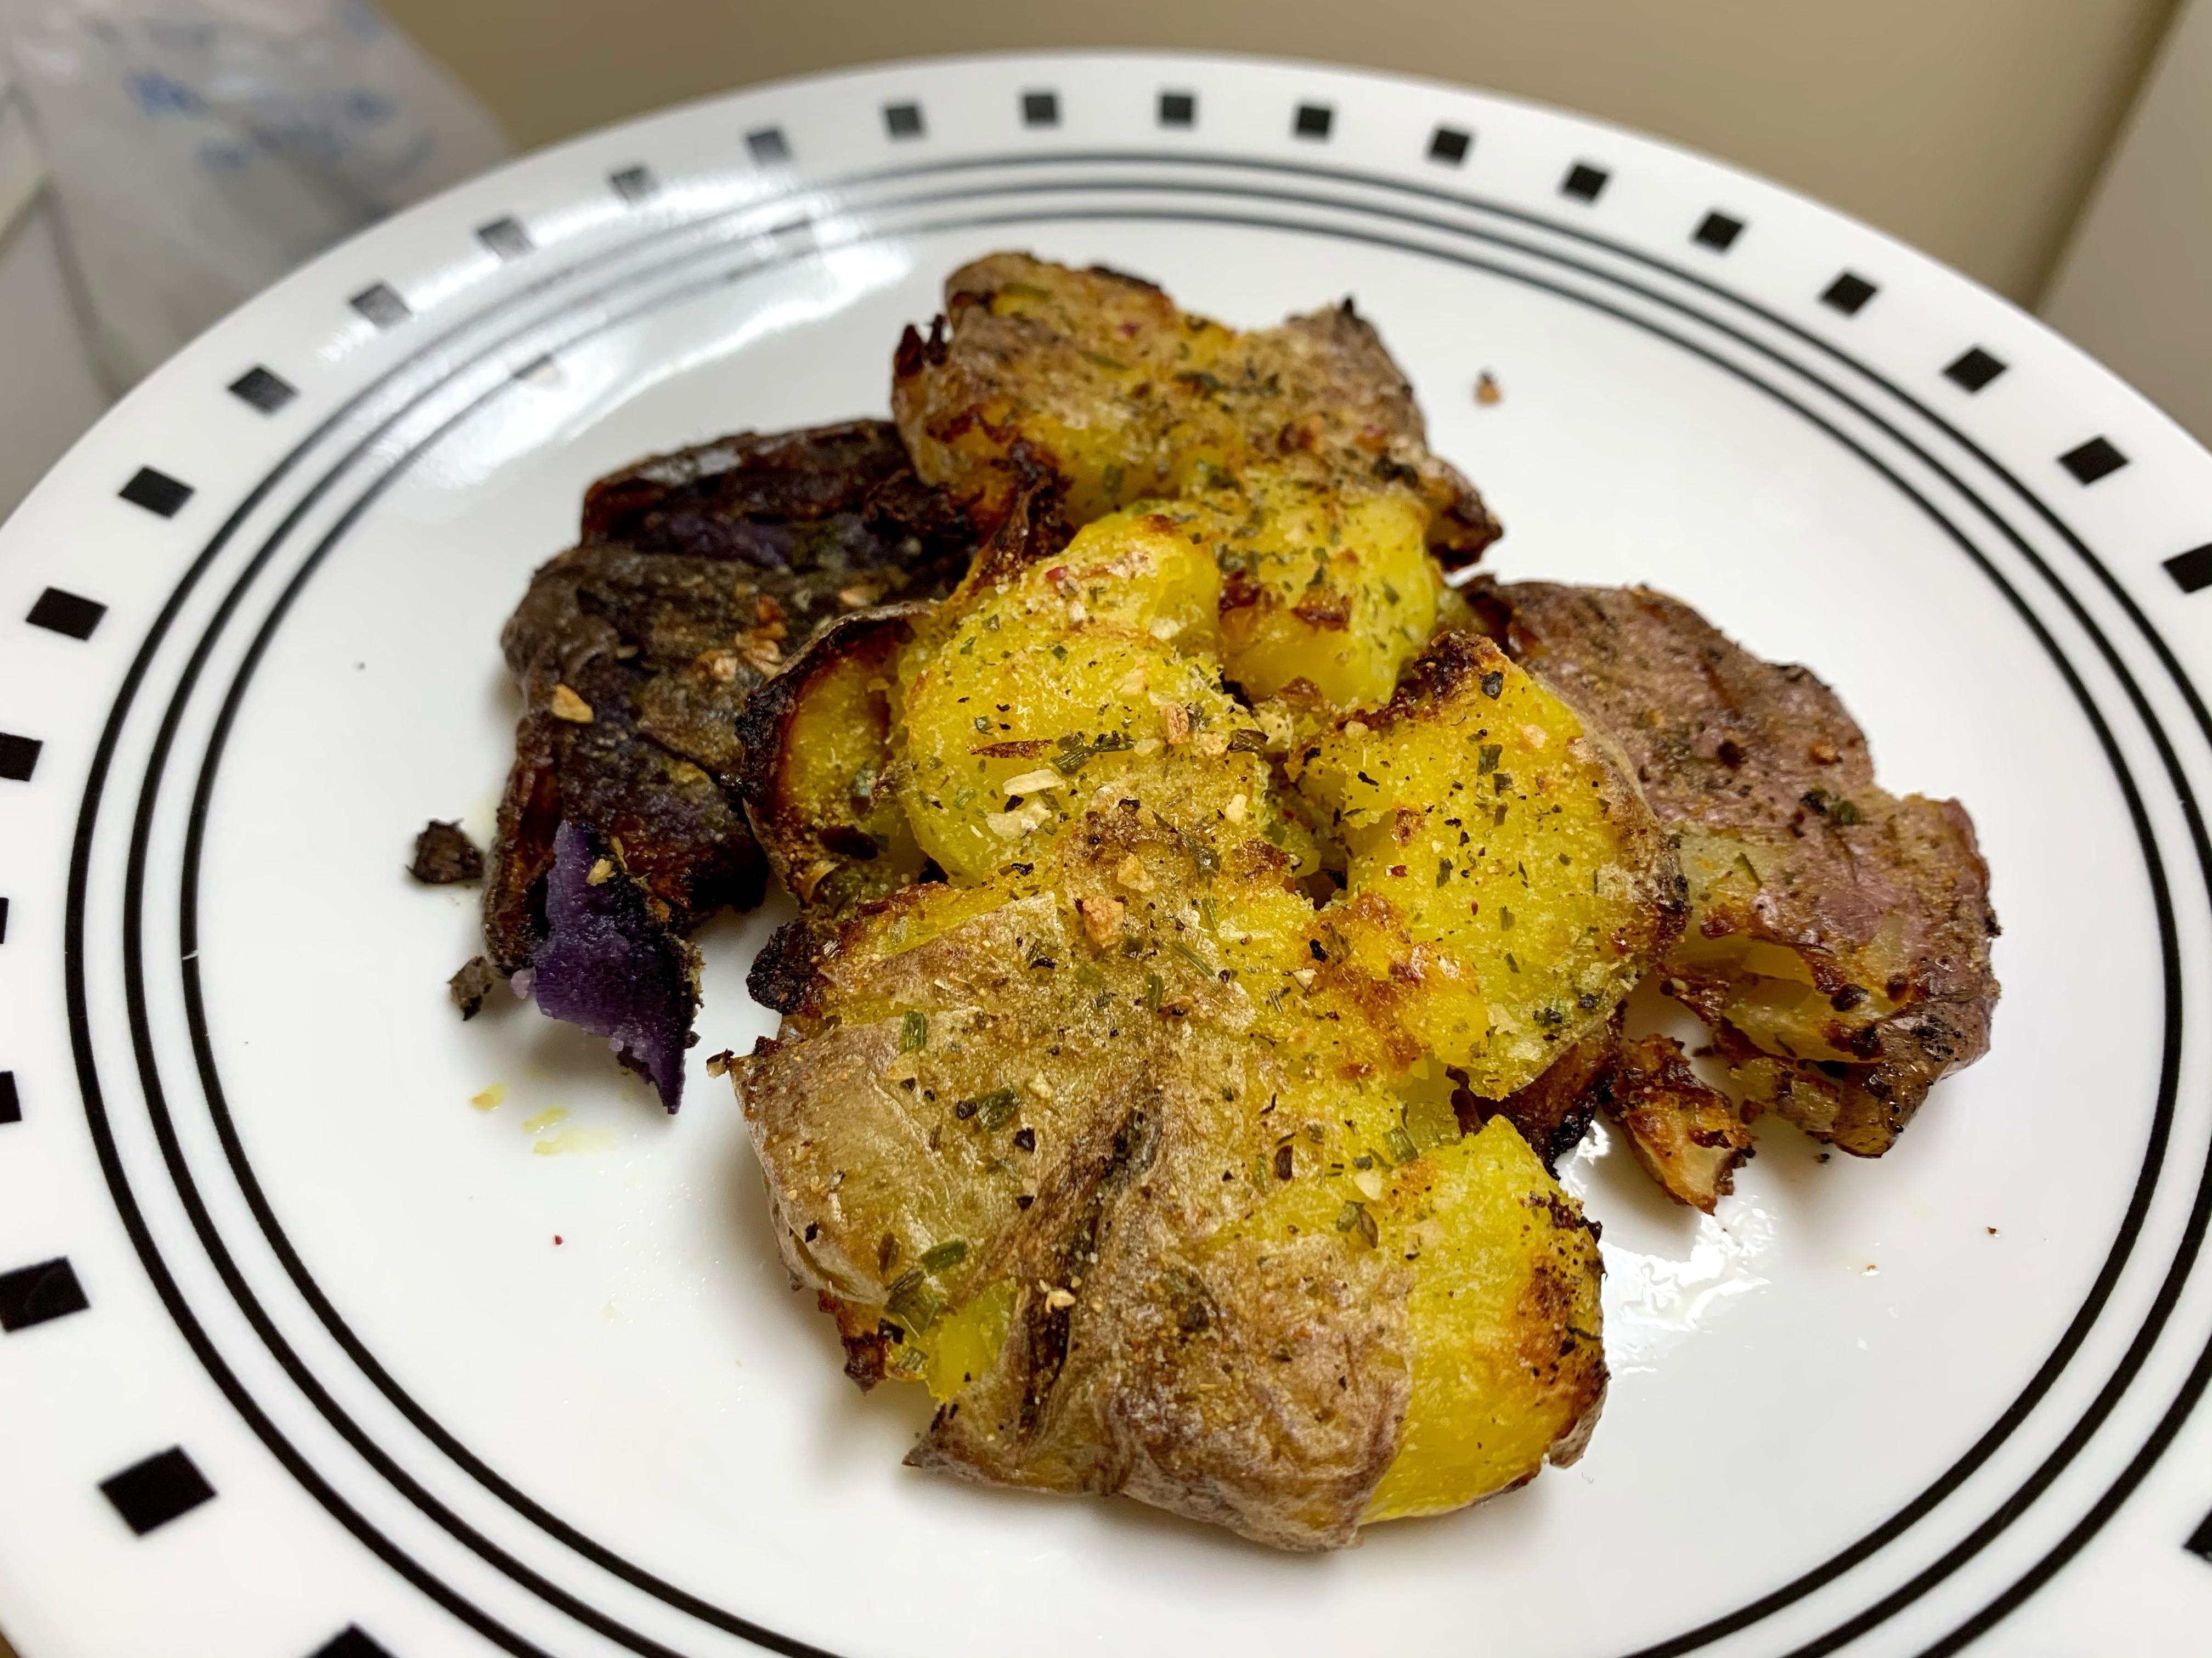 Crispy脆皮烤馬鈴薯🥔🍟